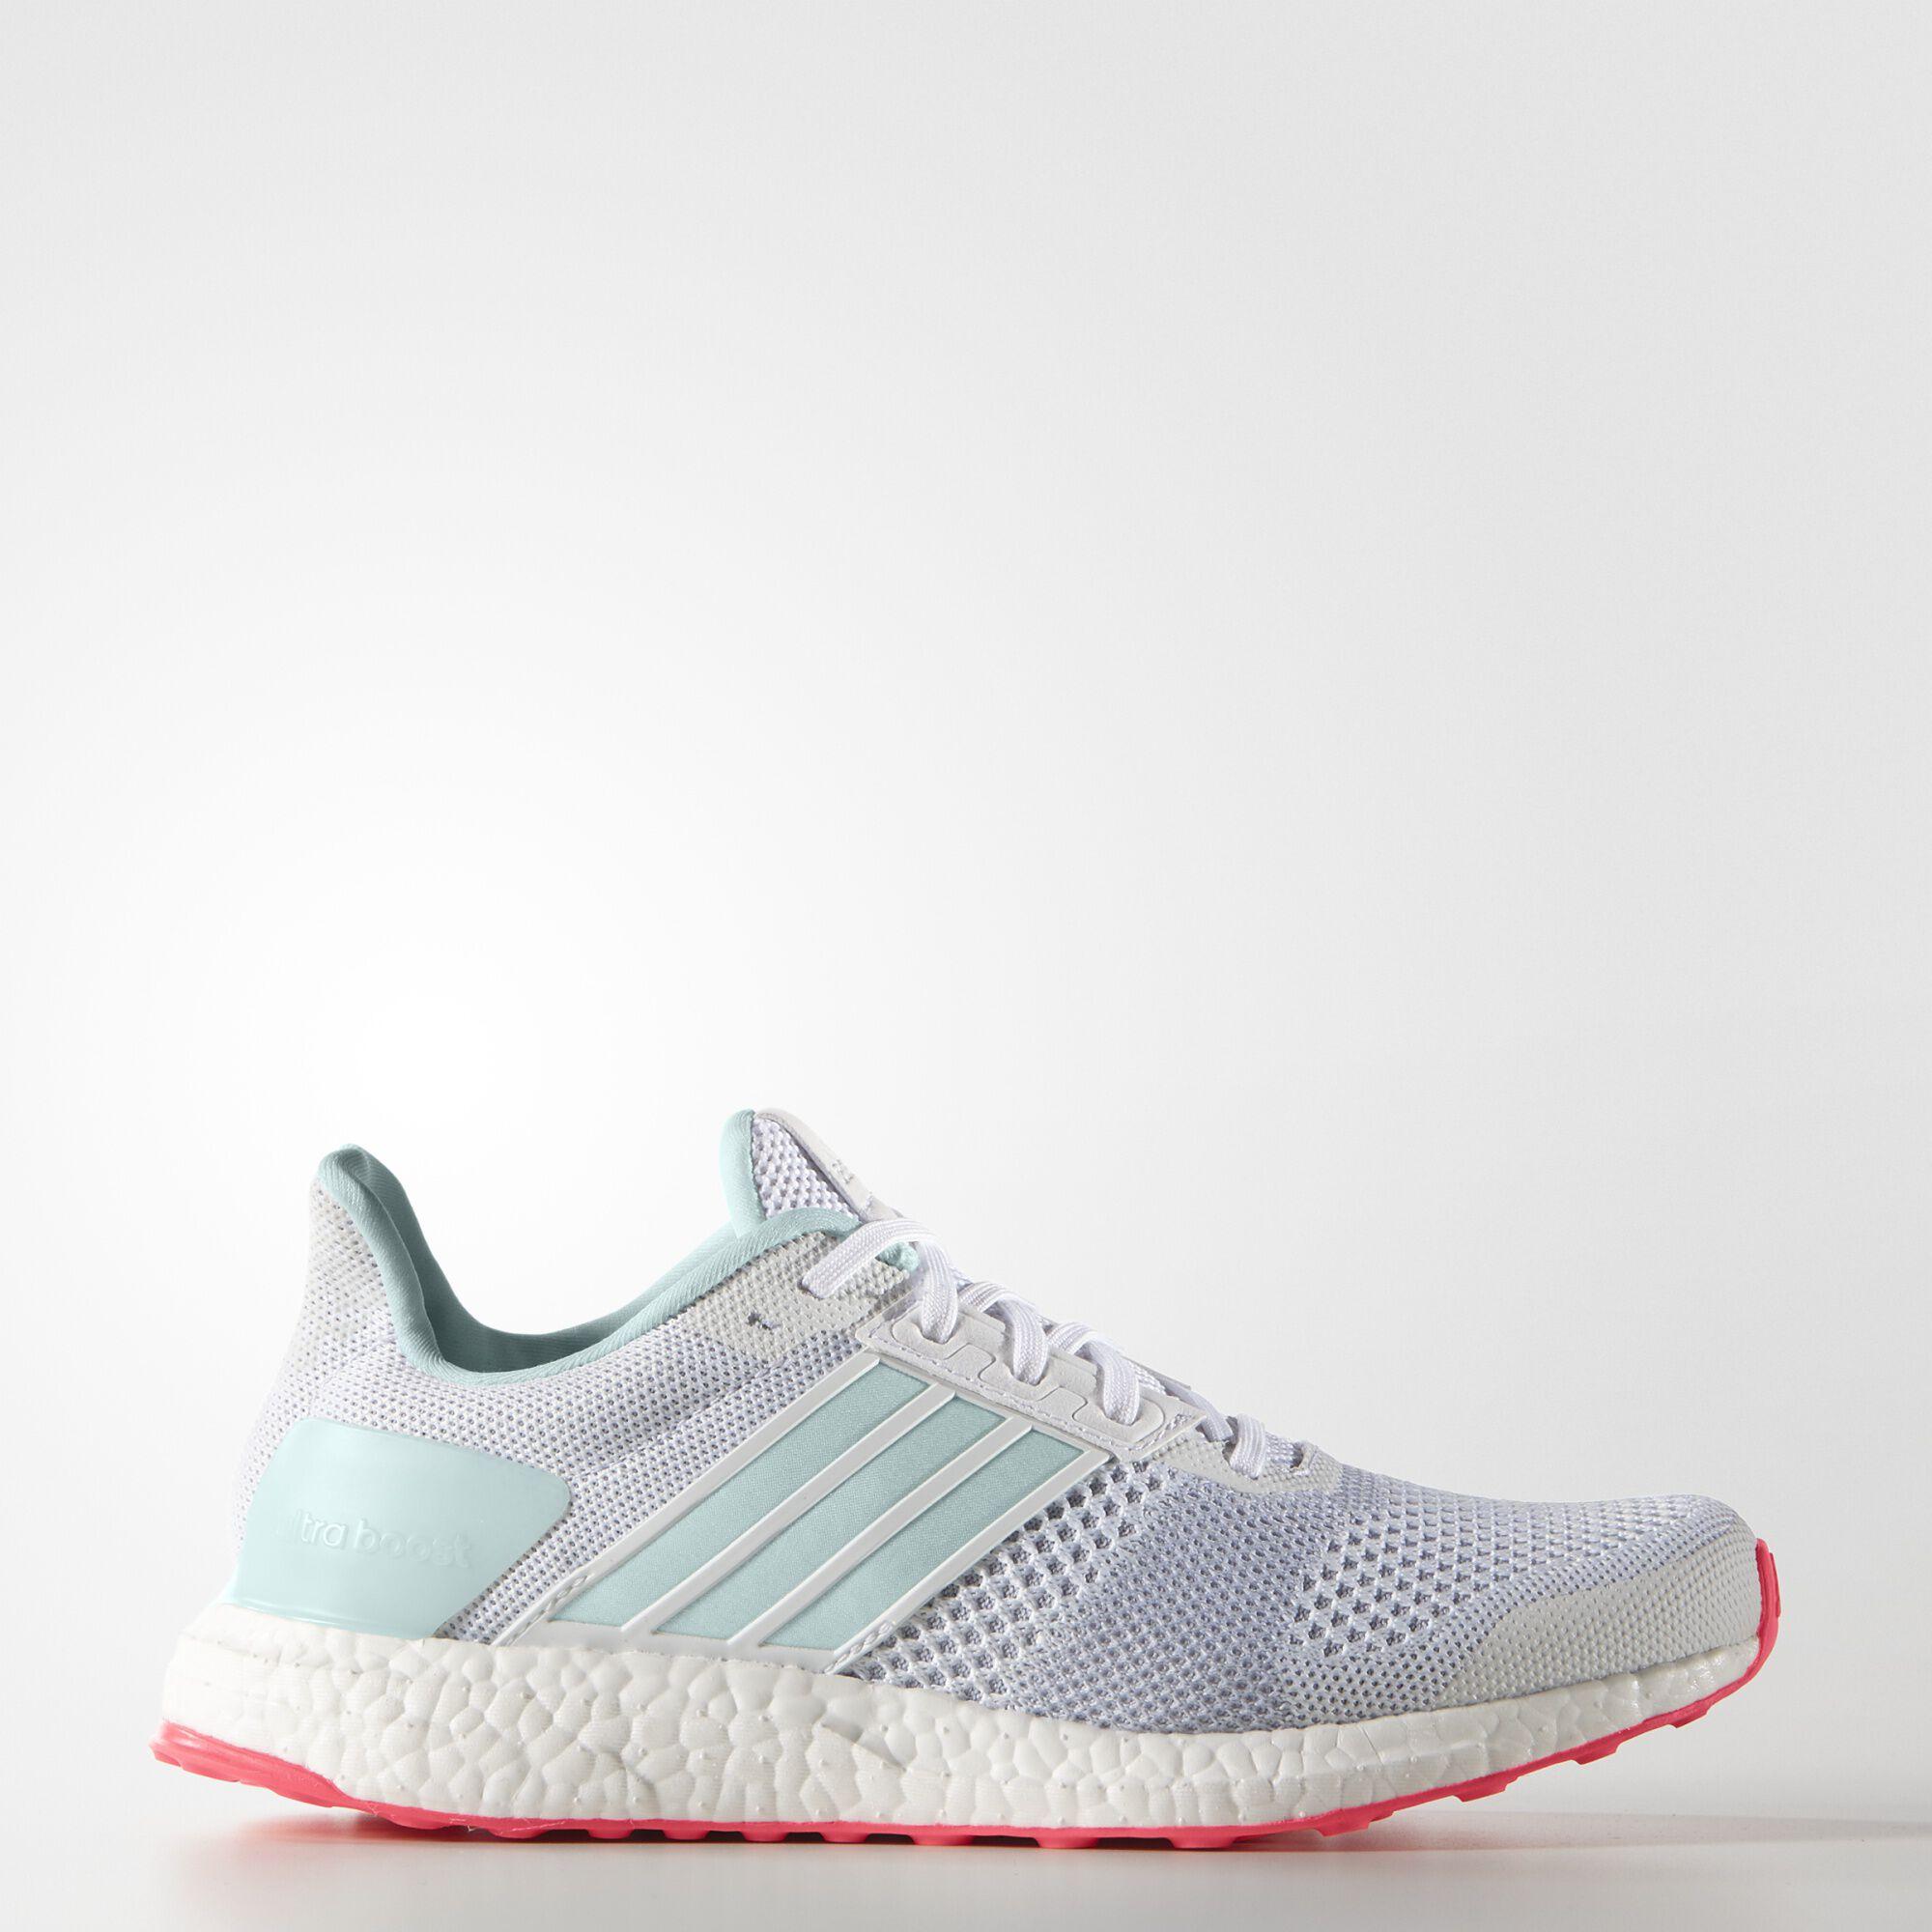 Adidas Ultra Boost V3